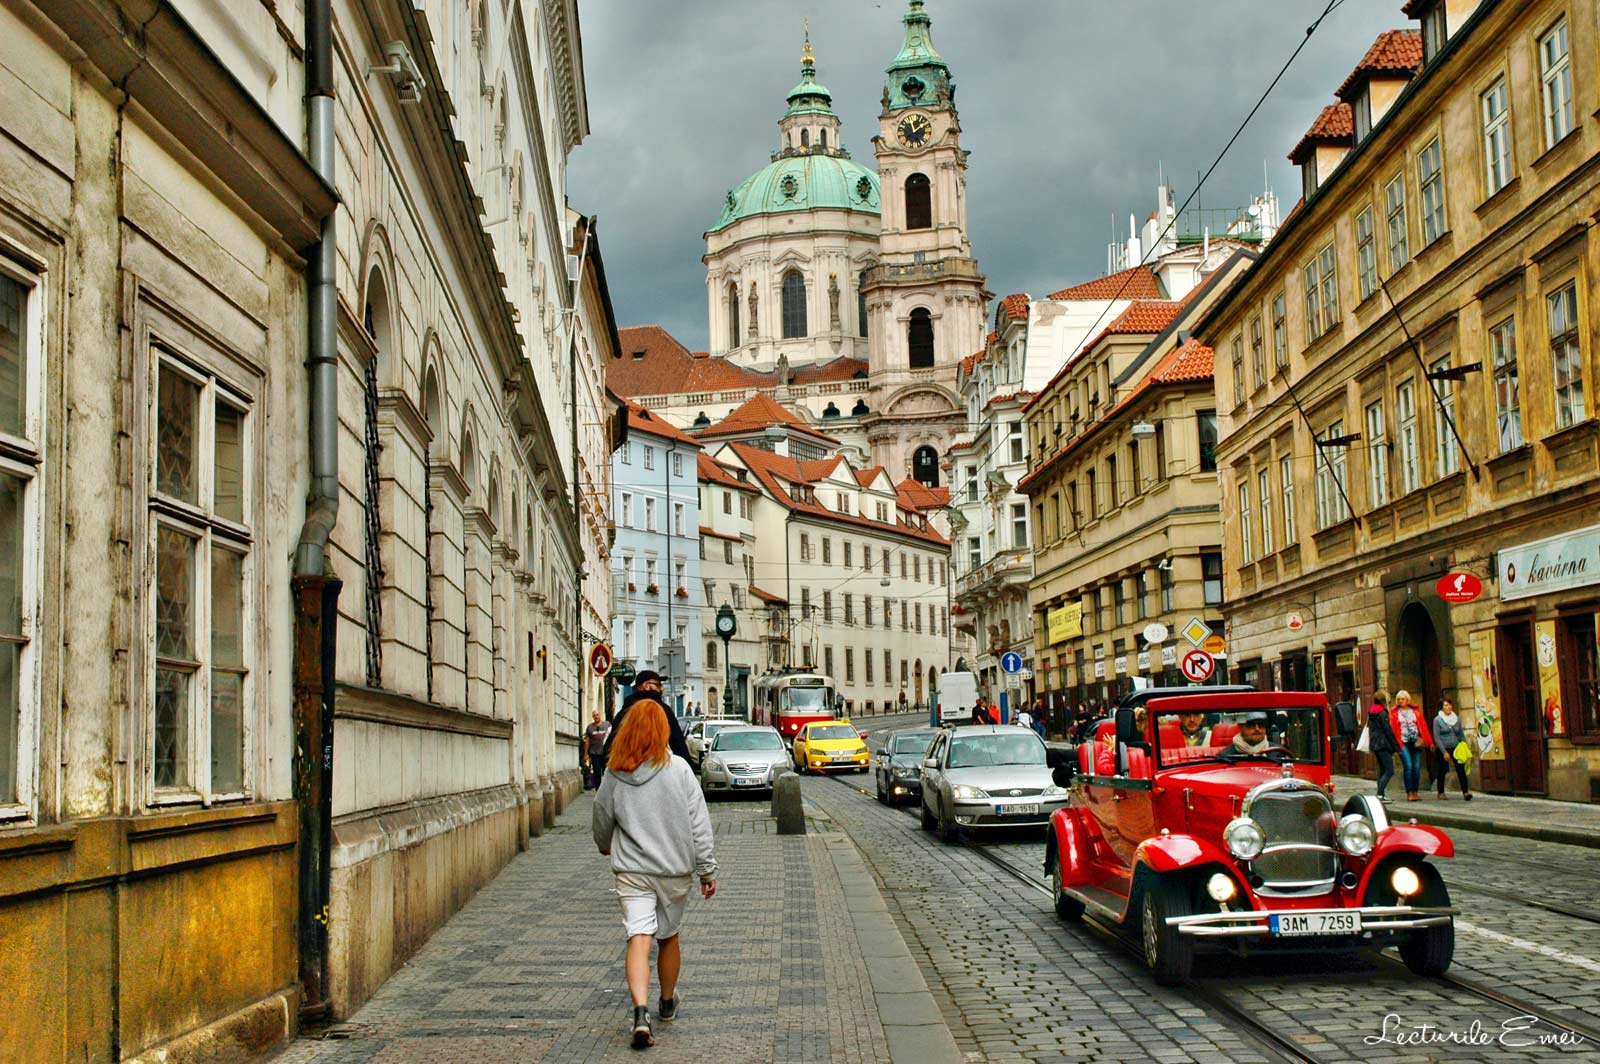 Stradă din cartierul Mala Strana, Praga